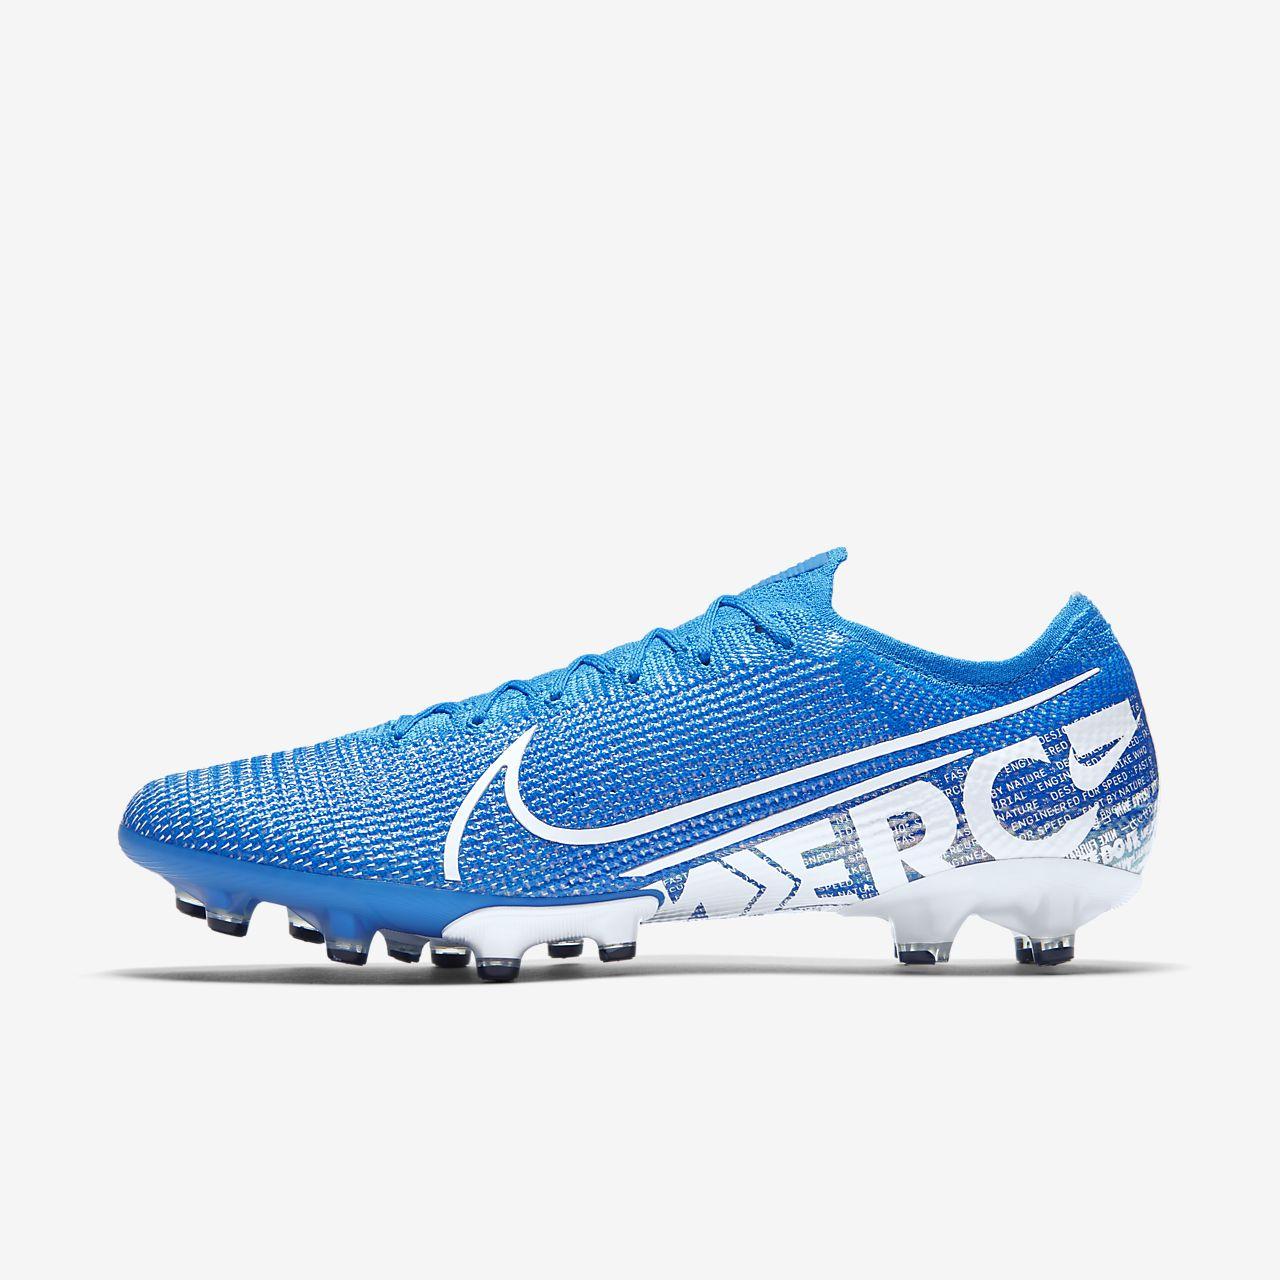 Nike Mercurial Vapor 13 Elite AG-PRO Voetbalschoen (kunstgras)